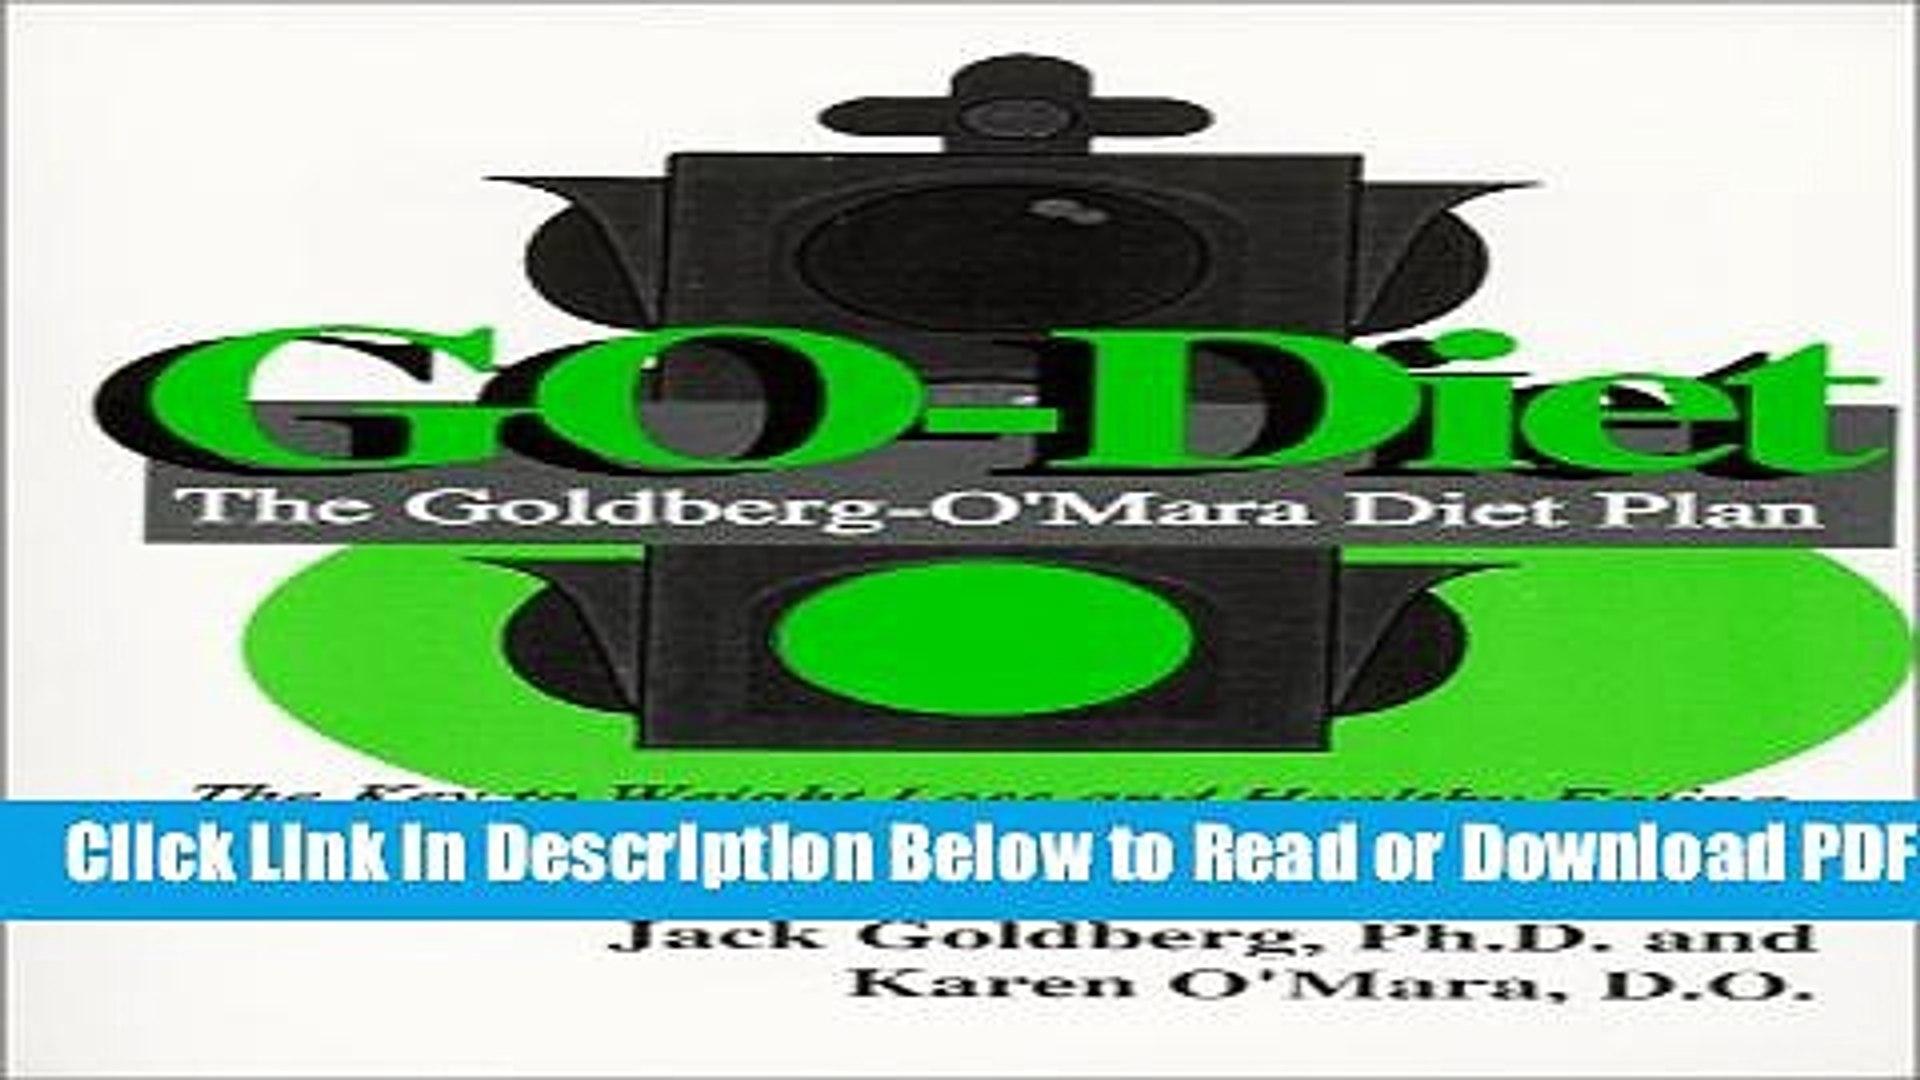 [Get] GO-Diet, The Goldberg-O Mara Diet Plan Popular New